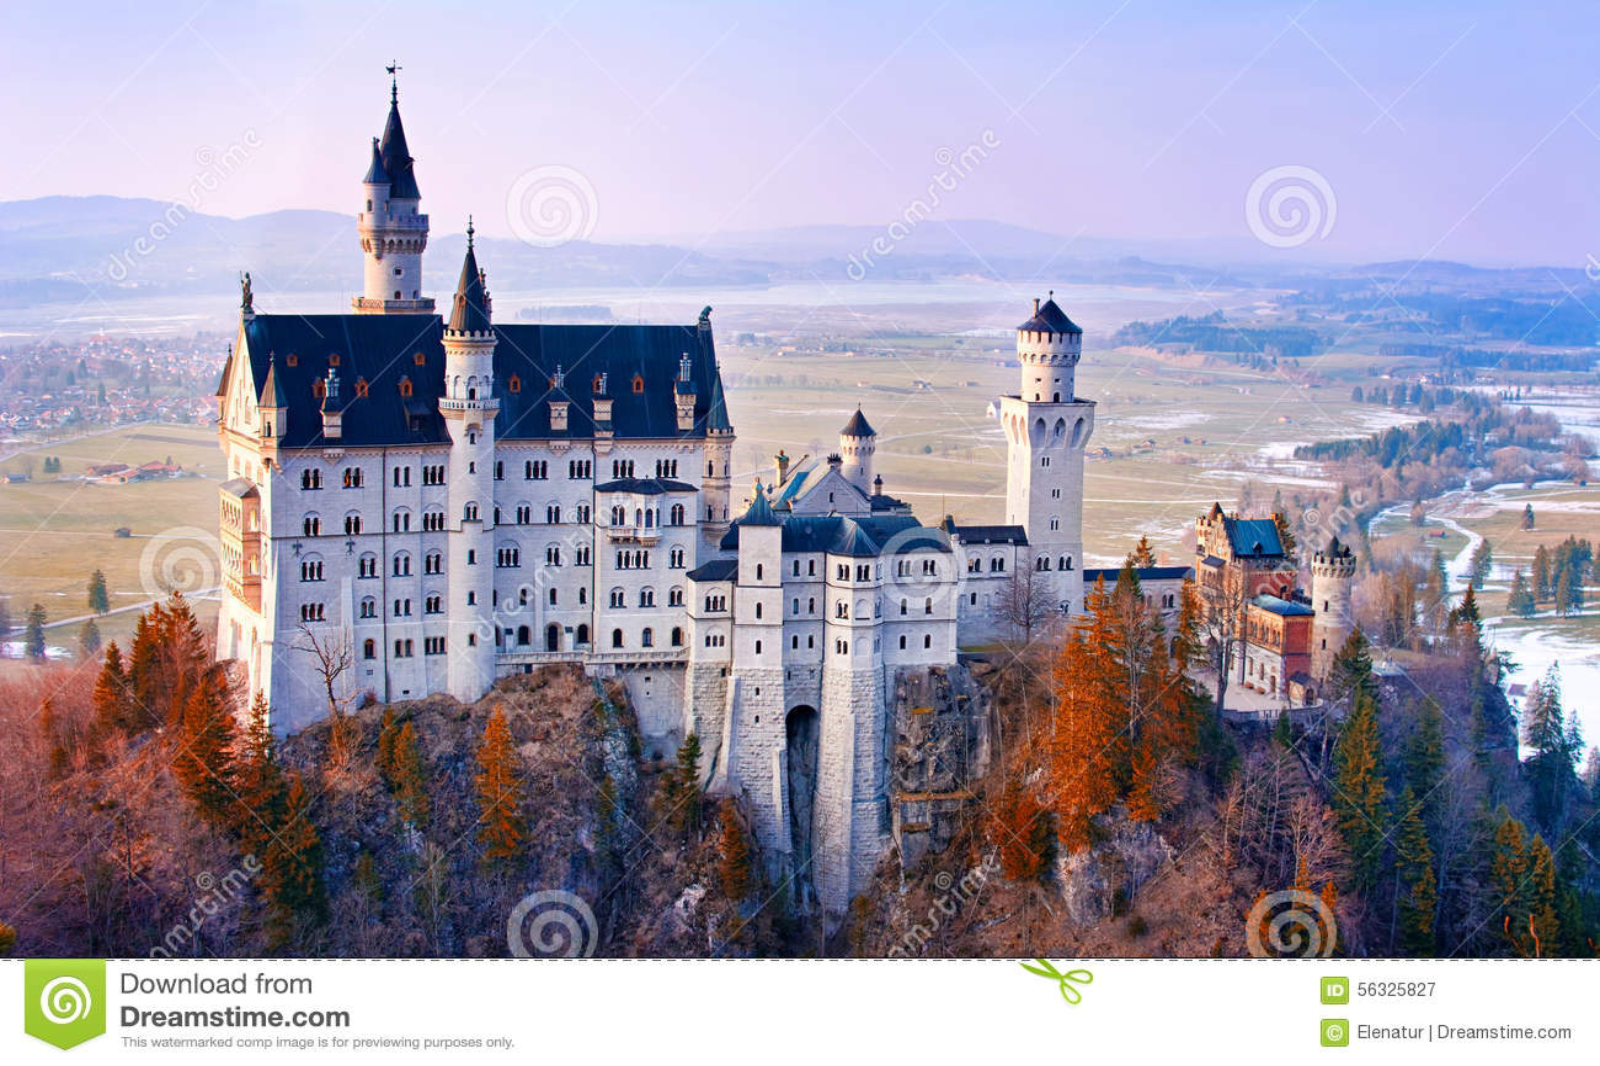 neuschwanstein beautiful fairytale castle near munich